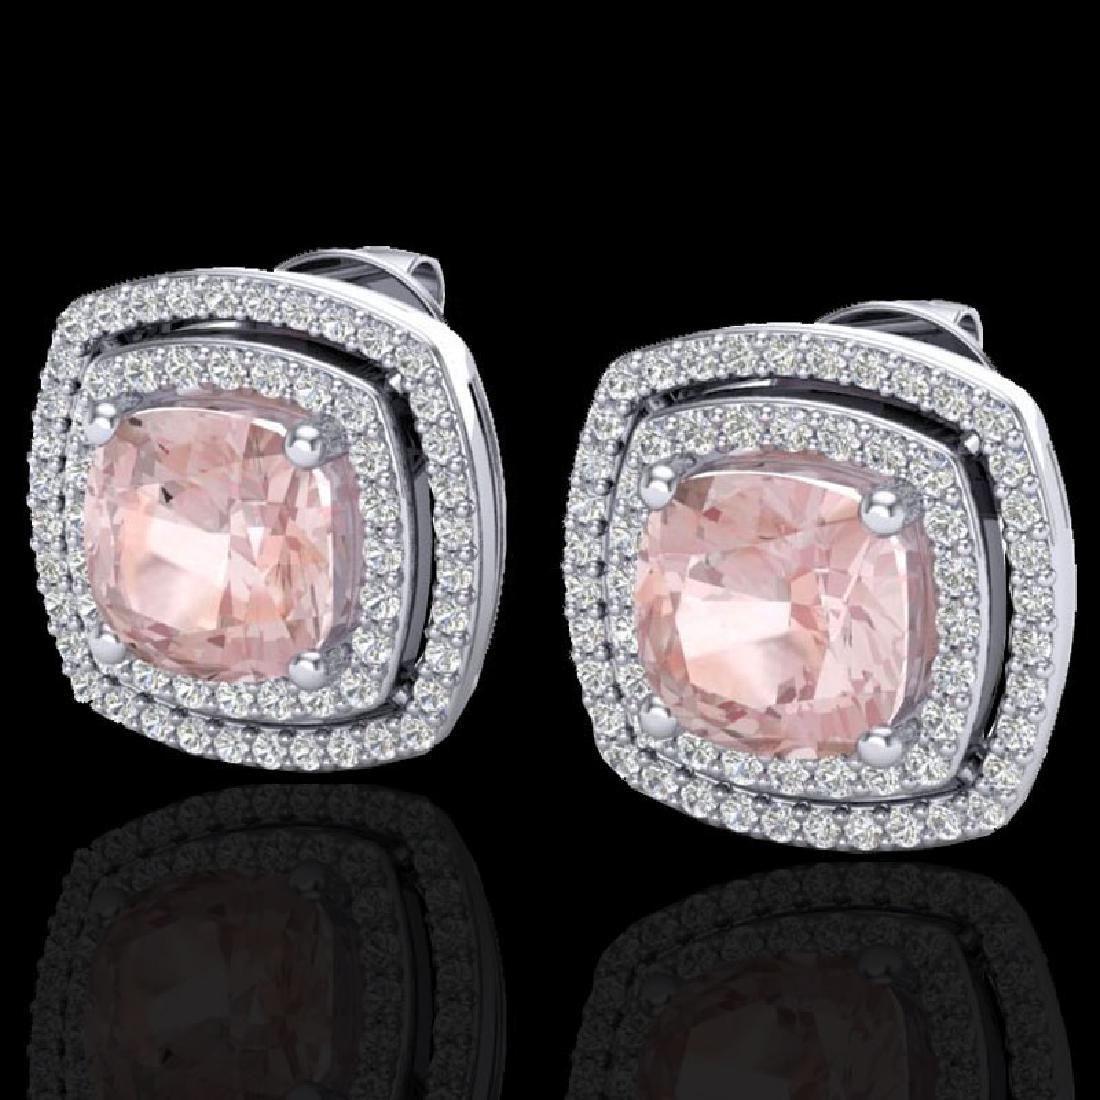 3.95 CTW Morganite & Micro Pave VS/SI Diamond Halo